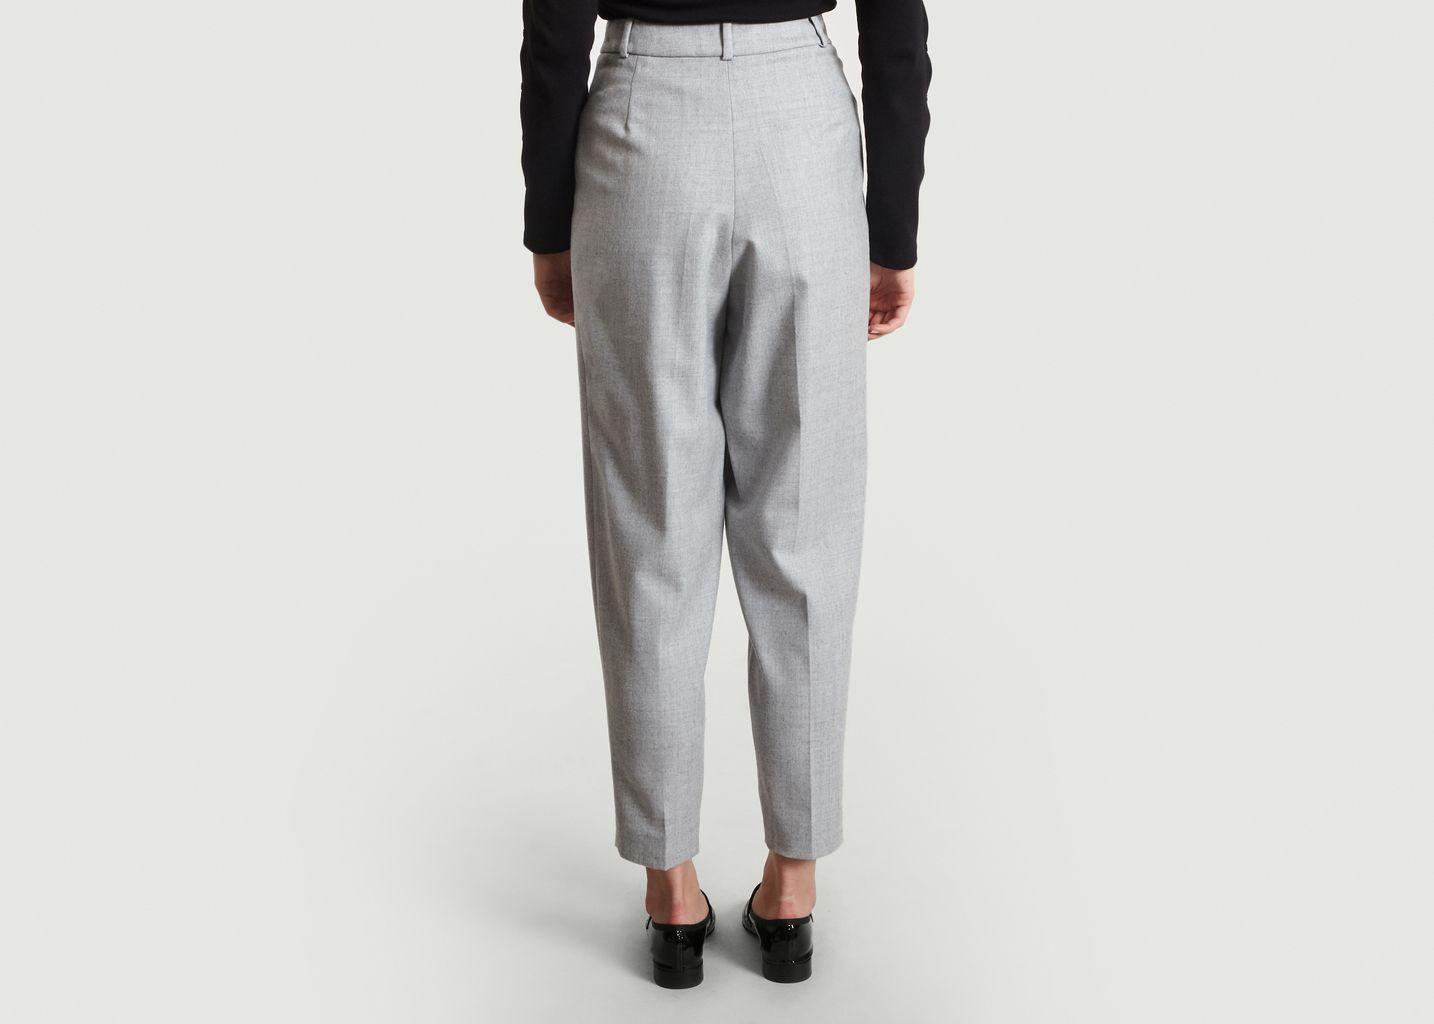 Pantalon Jane - Les Garçonnes